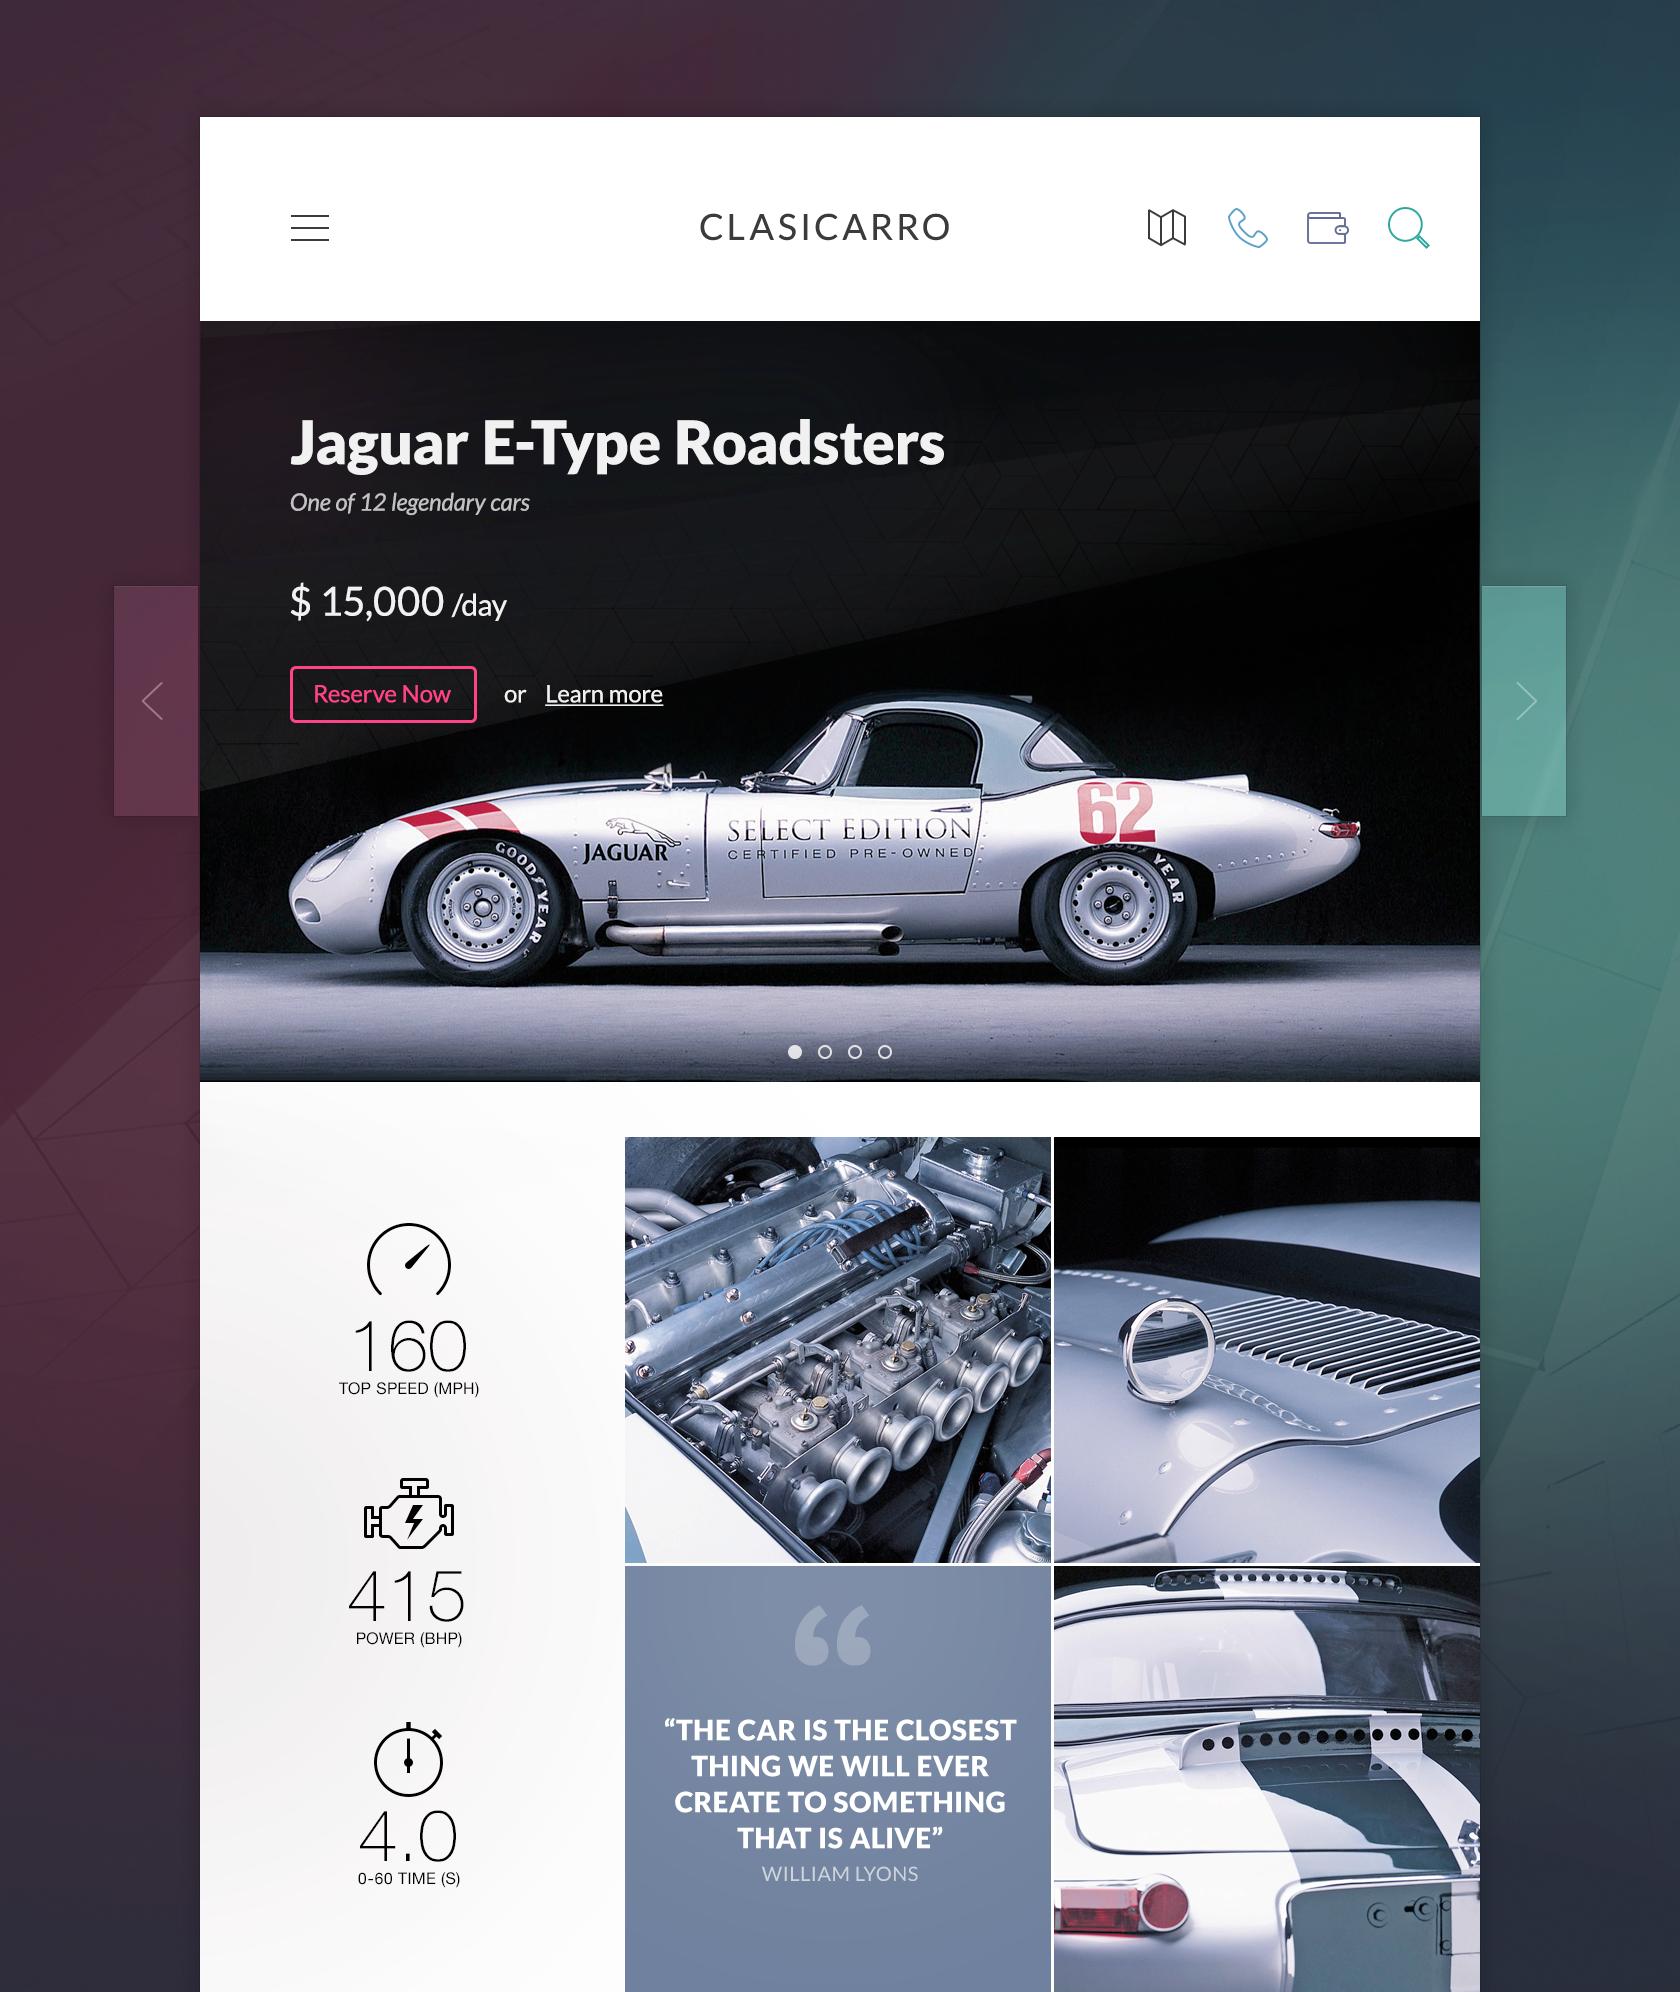 Dribbble social app ui design jpg by ramotion - Car Rental Service